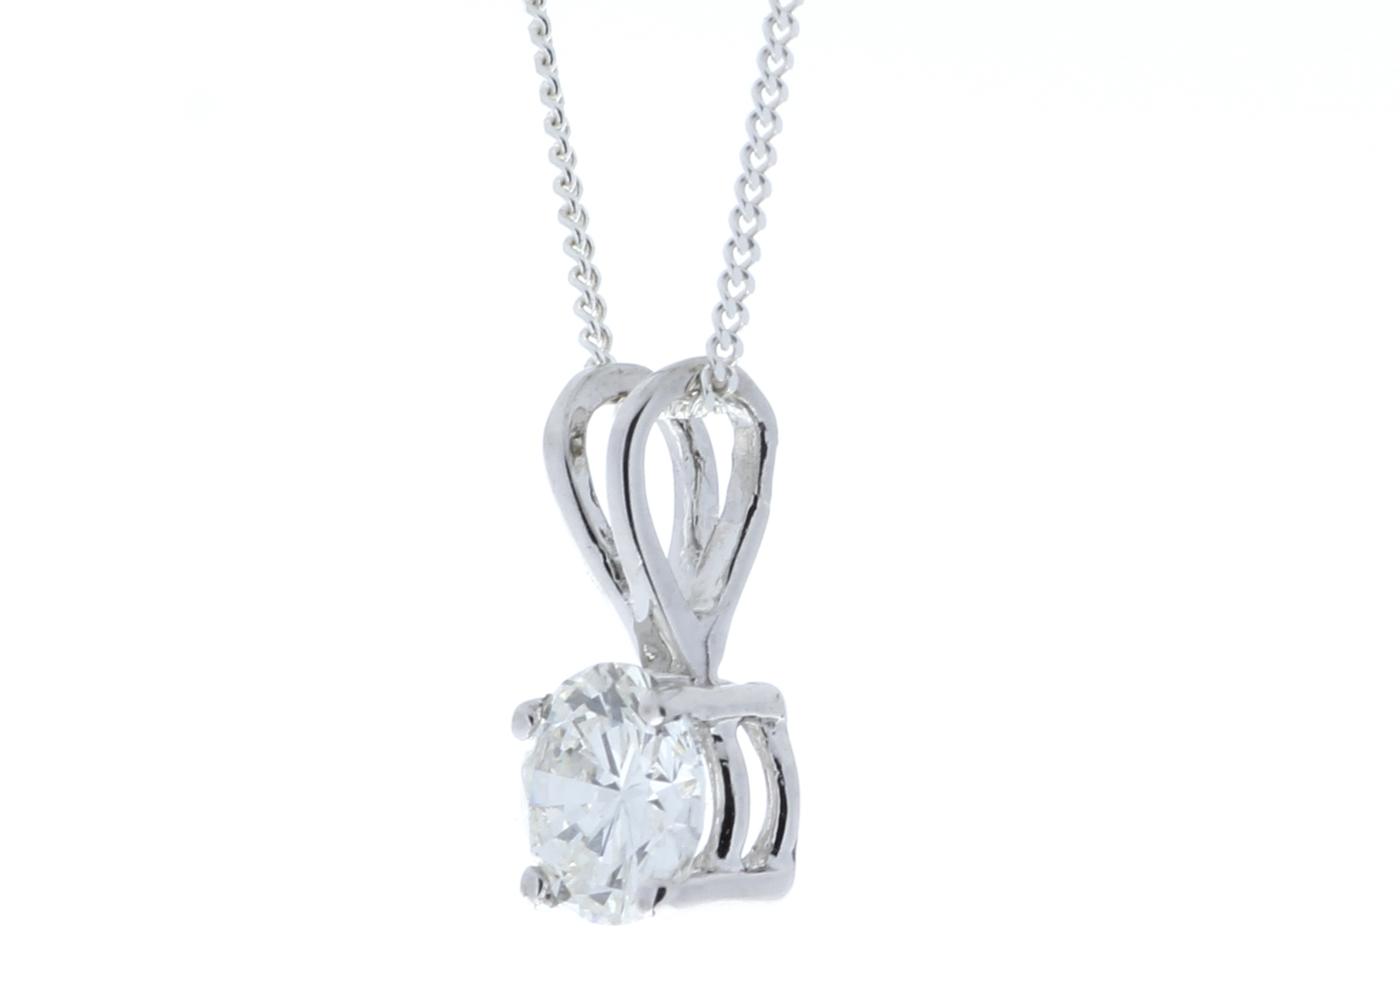 Lot 41 - 18ct Single Stone Claw Set Diamond Pendant 0.50 Carats